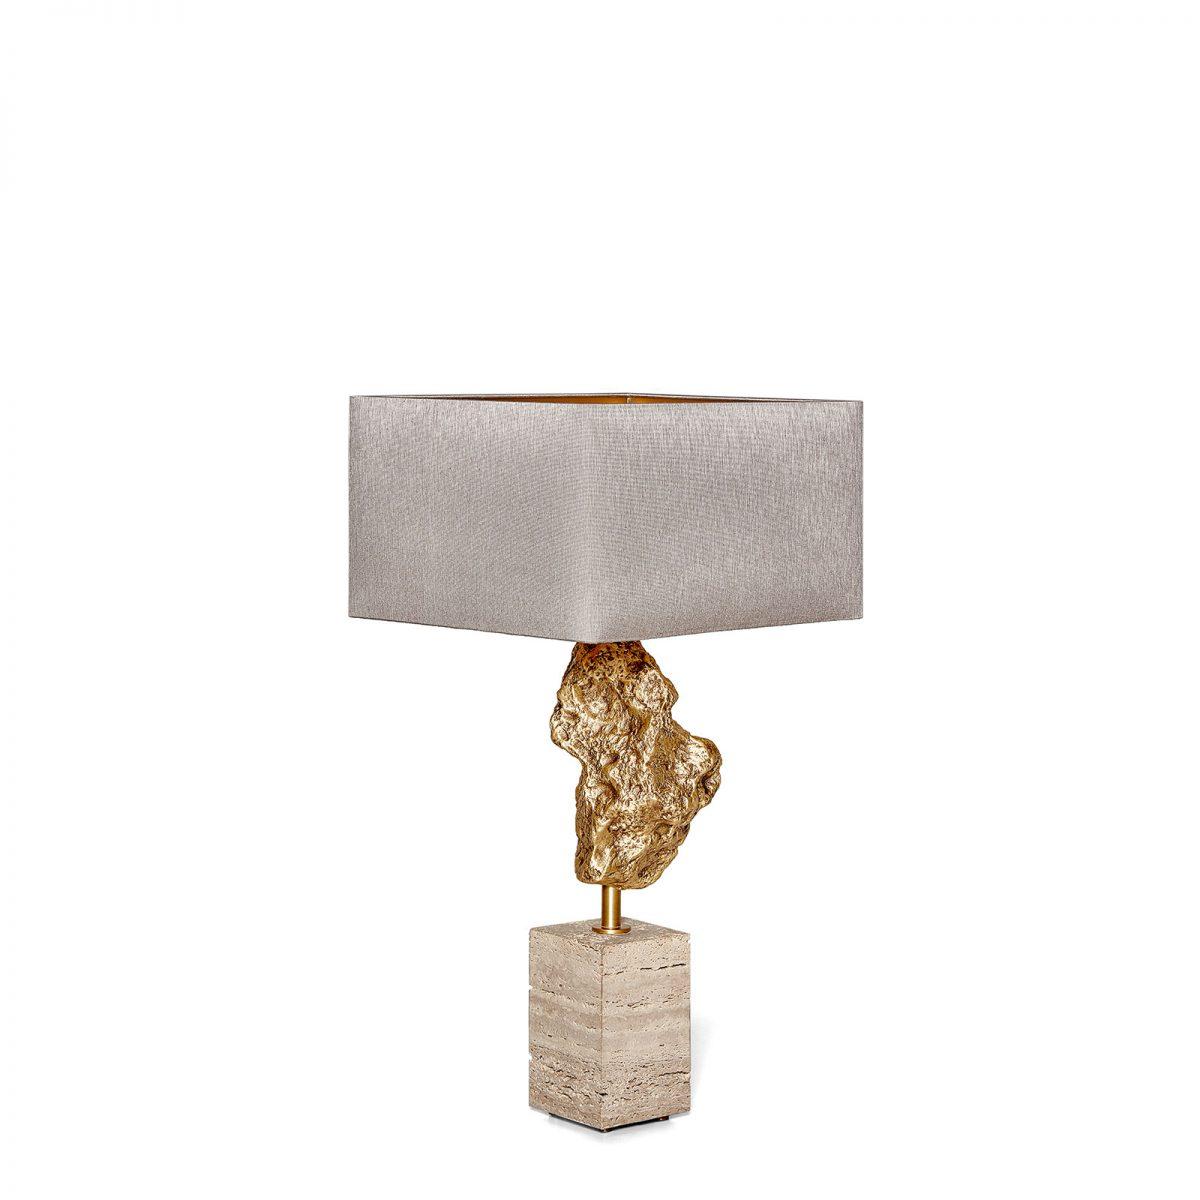 Magma Table Lamp, with the Medium rectangular lampshade